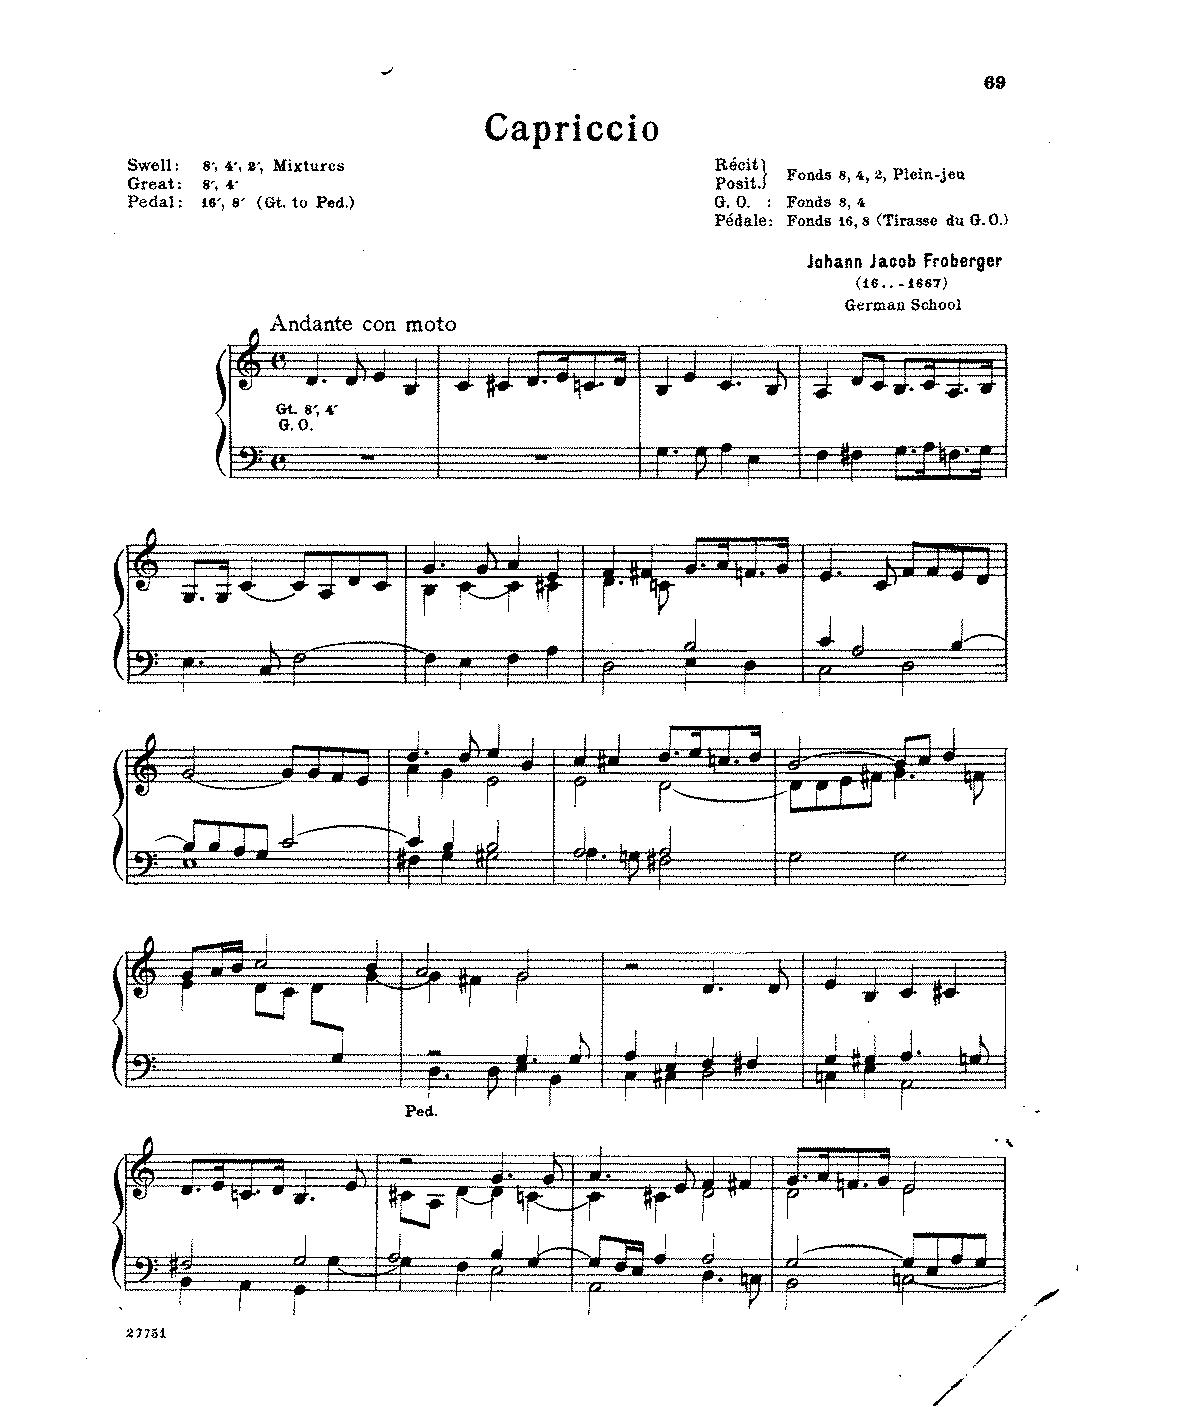 Free Sheet Music Public Domain: Capriccios (Froberger, Johann Jacob)